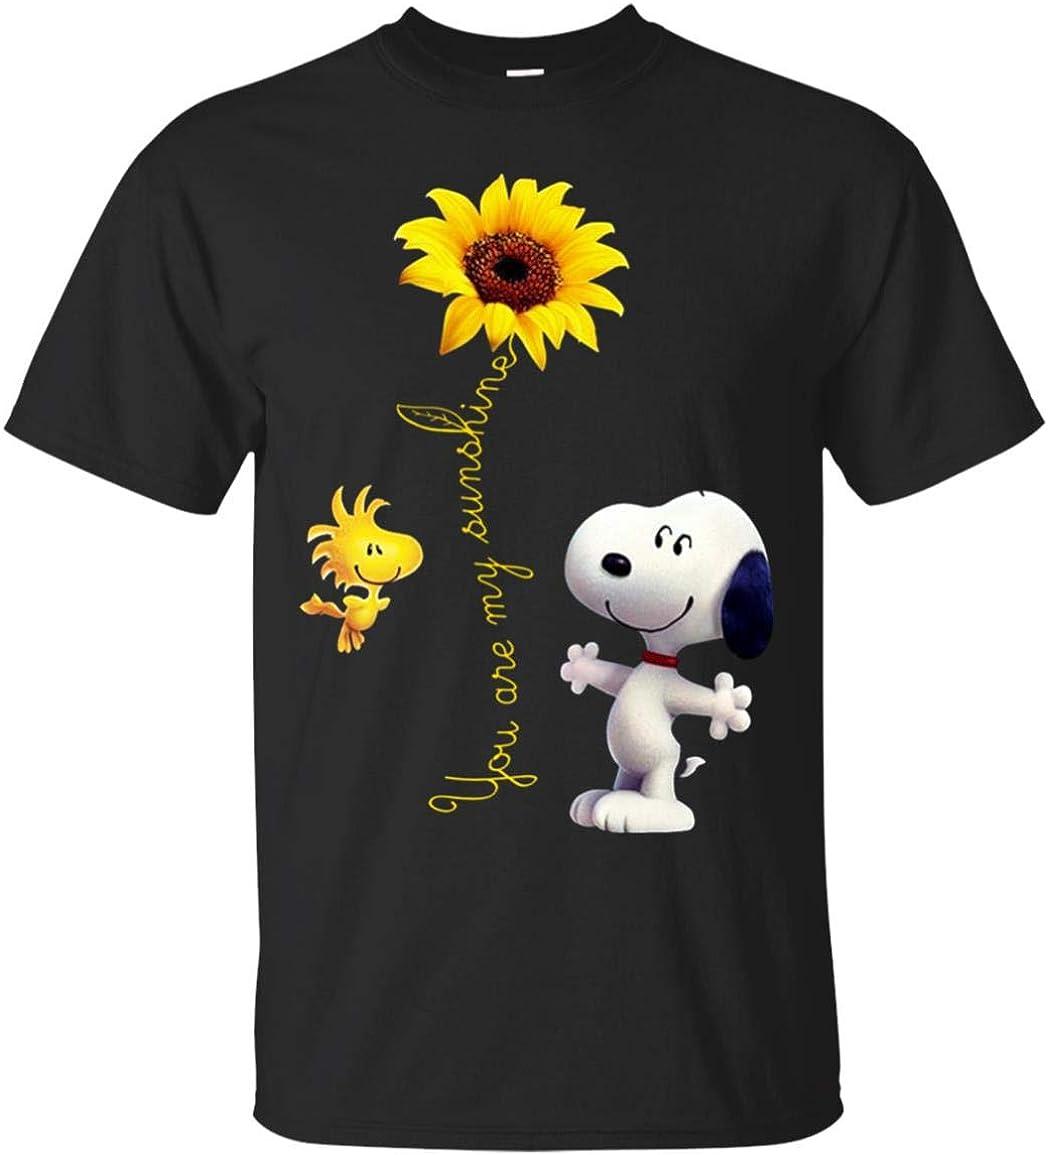 USA Shop Snoopy You are My Sunshine